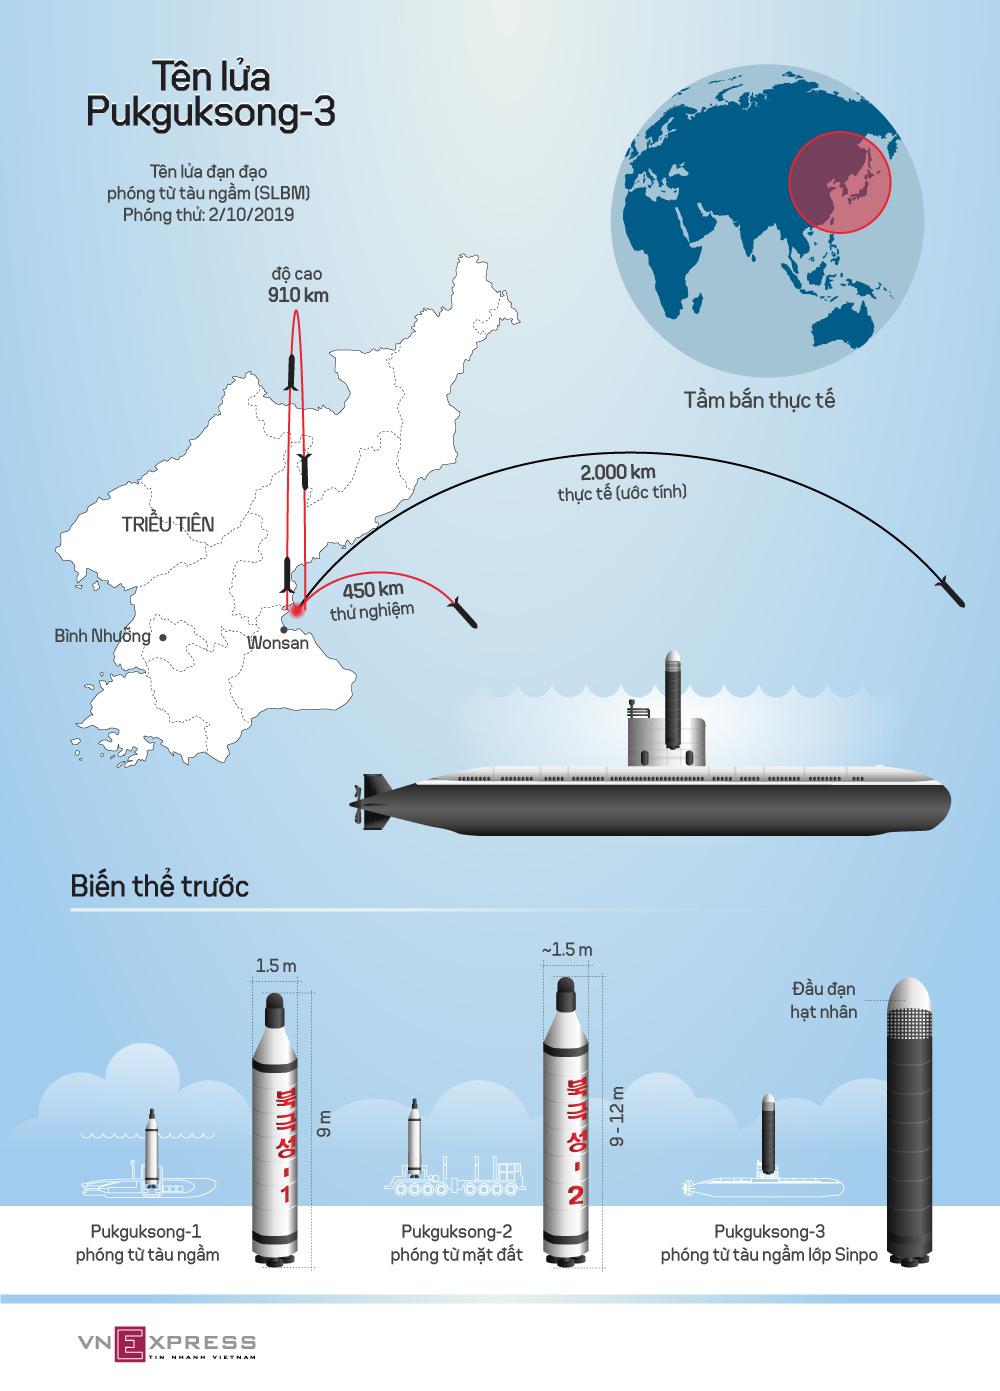 Mối đe dọa từ tên lửa Pukguksong-3